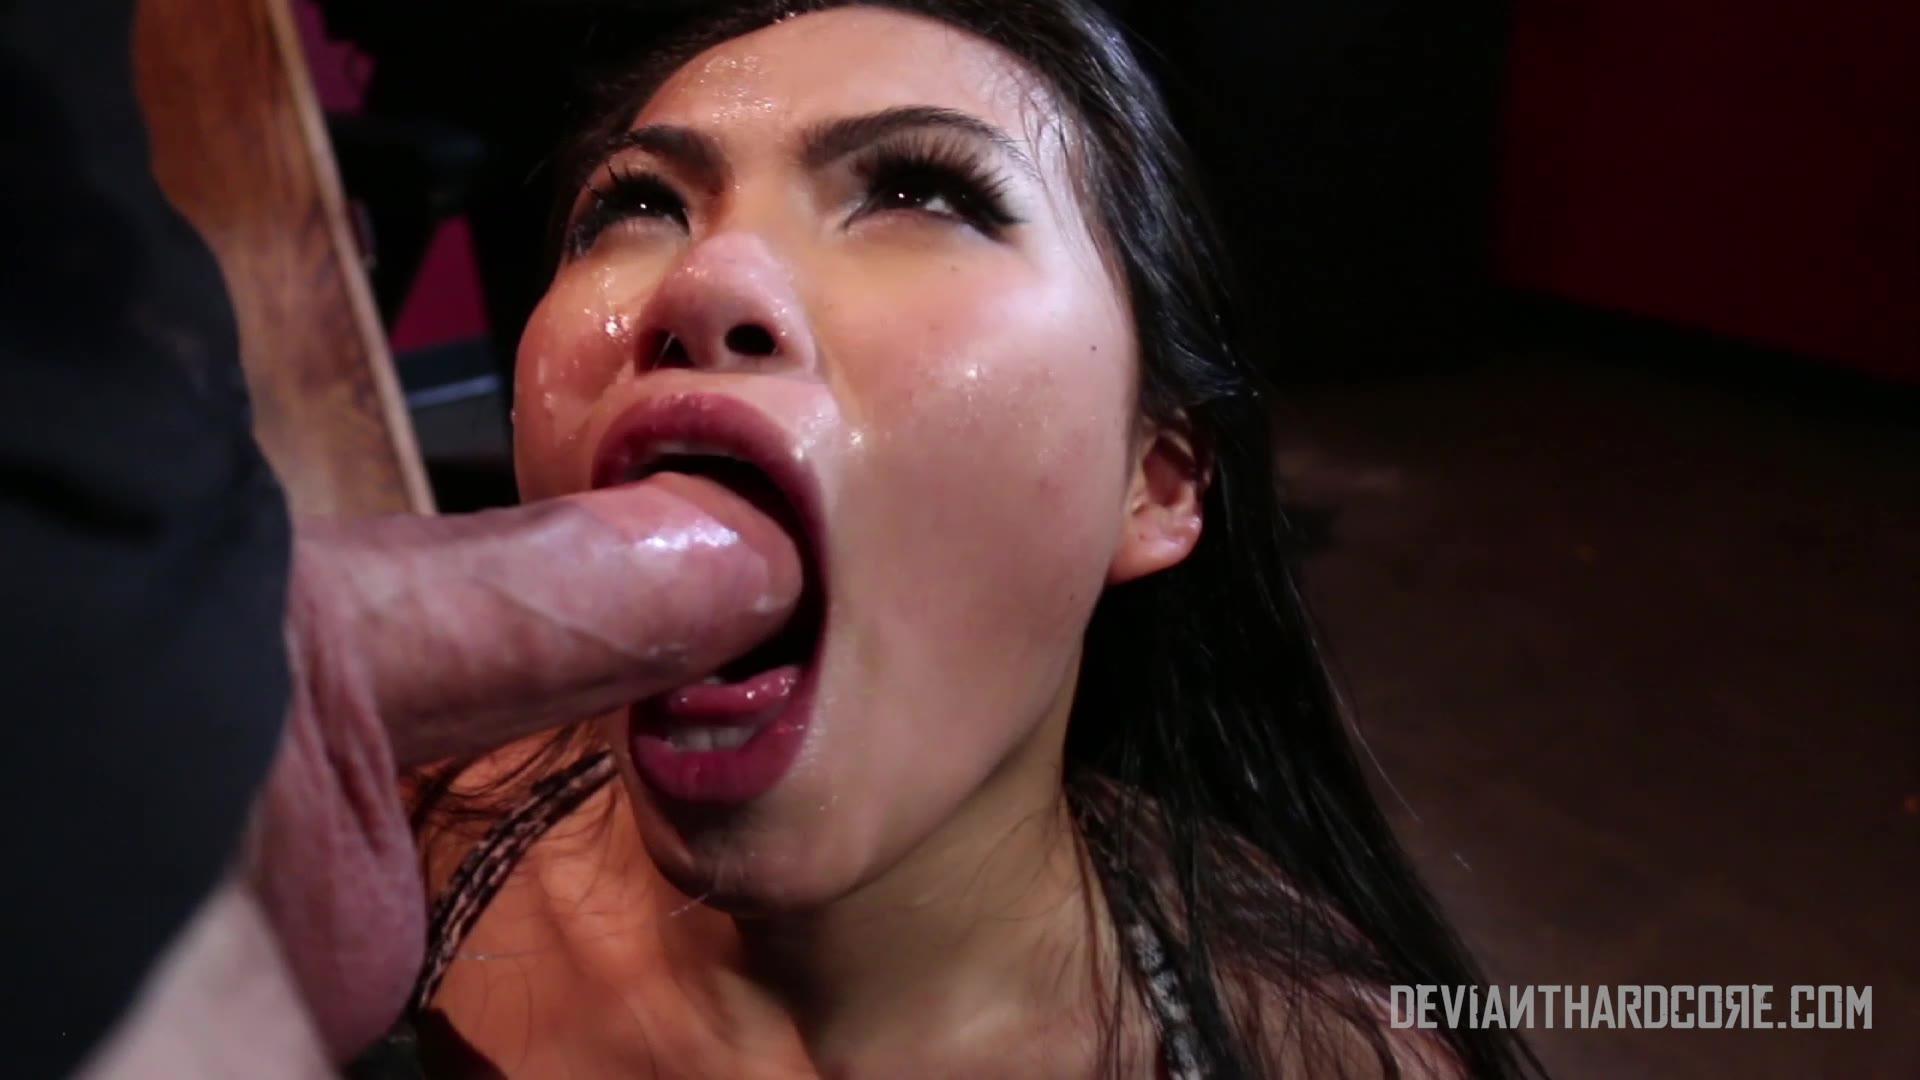 Free deviant hardcore porn pics hot sex images